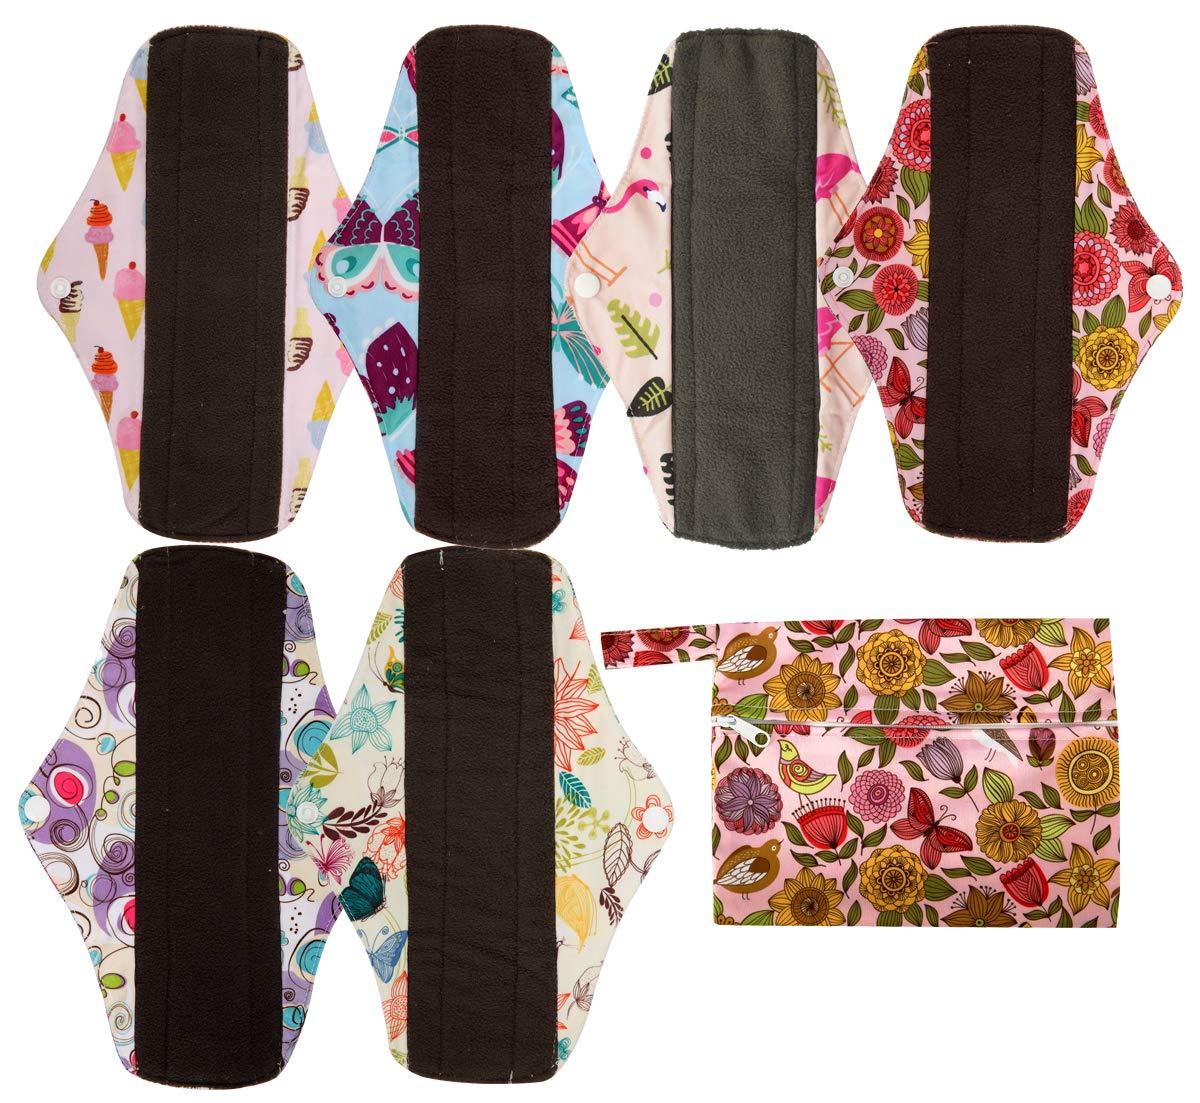 7pcs Set 1pc Mini Wet Bag +6pcs 10 Inch Regular Charcoal Bamboo Mama Cloth/Menstrual Pads/Reusable Sanitary Pads (Sunflower)